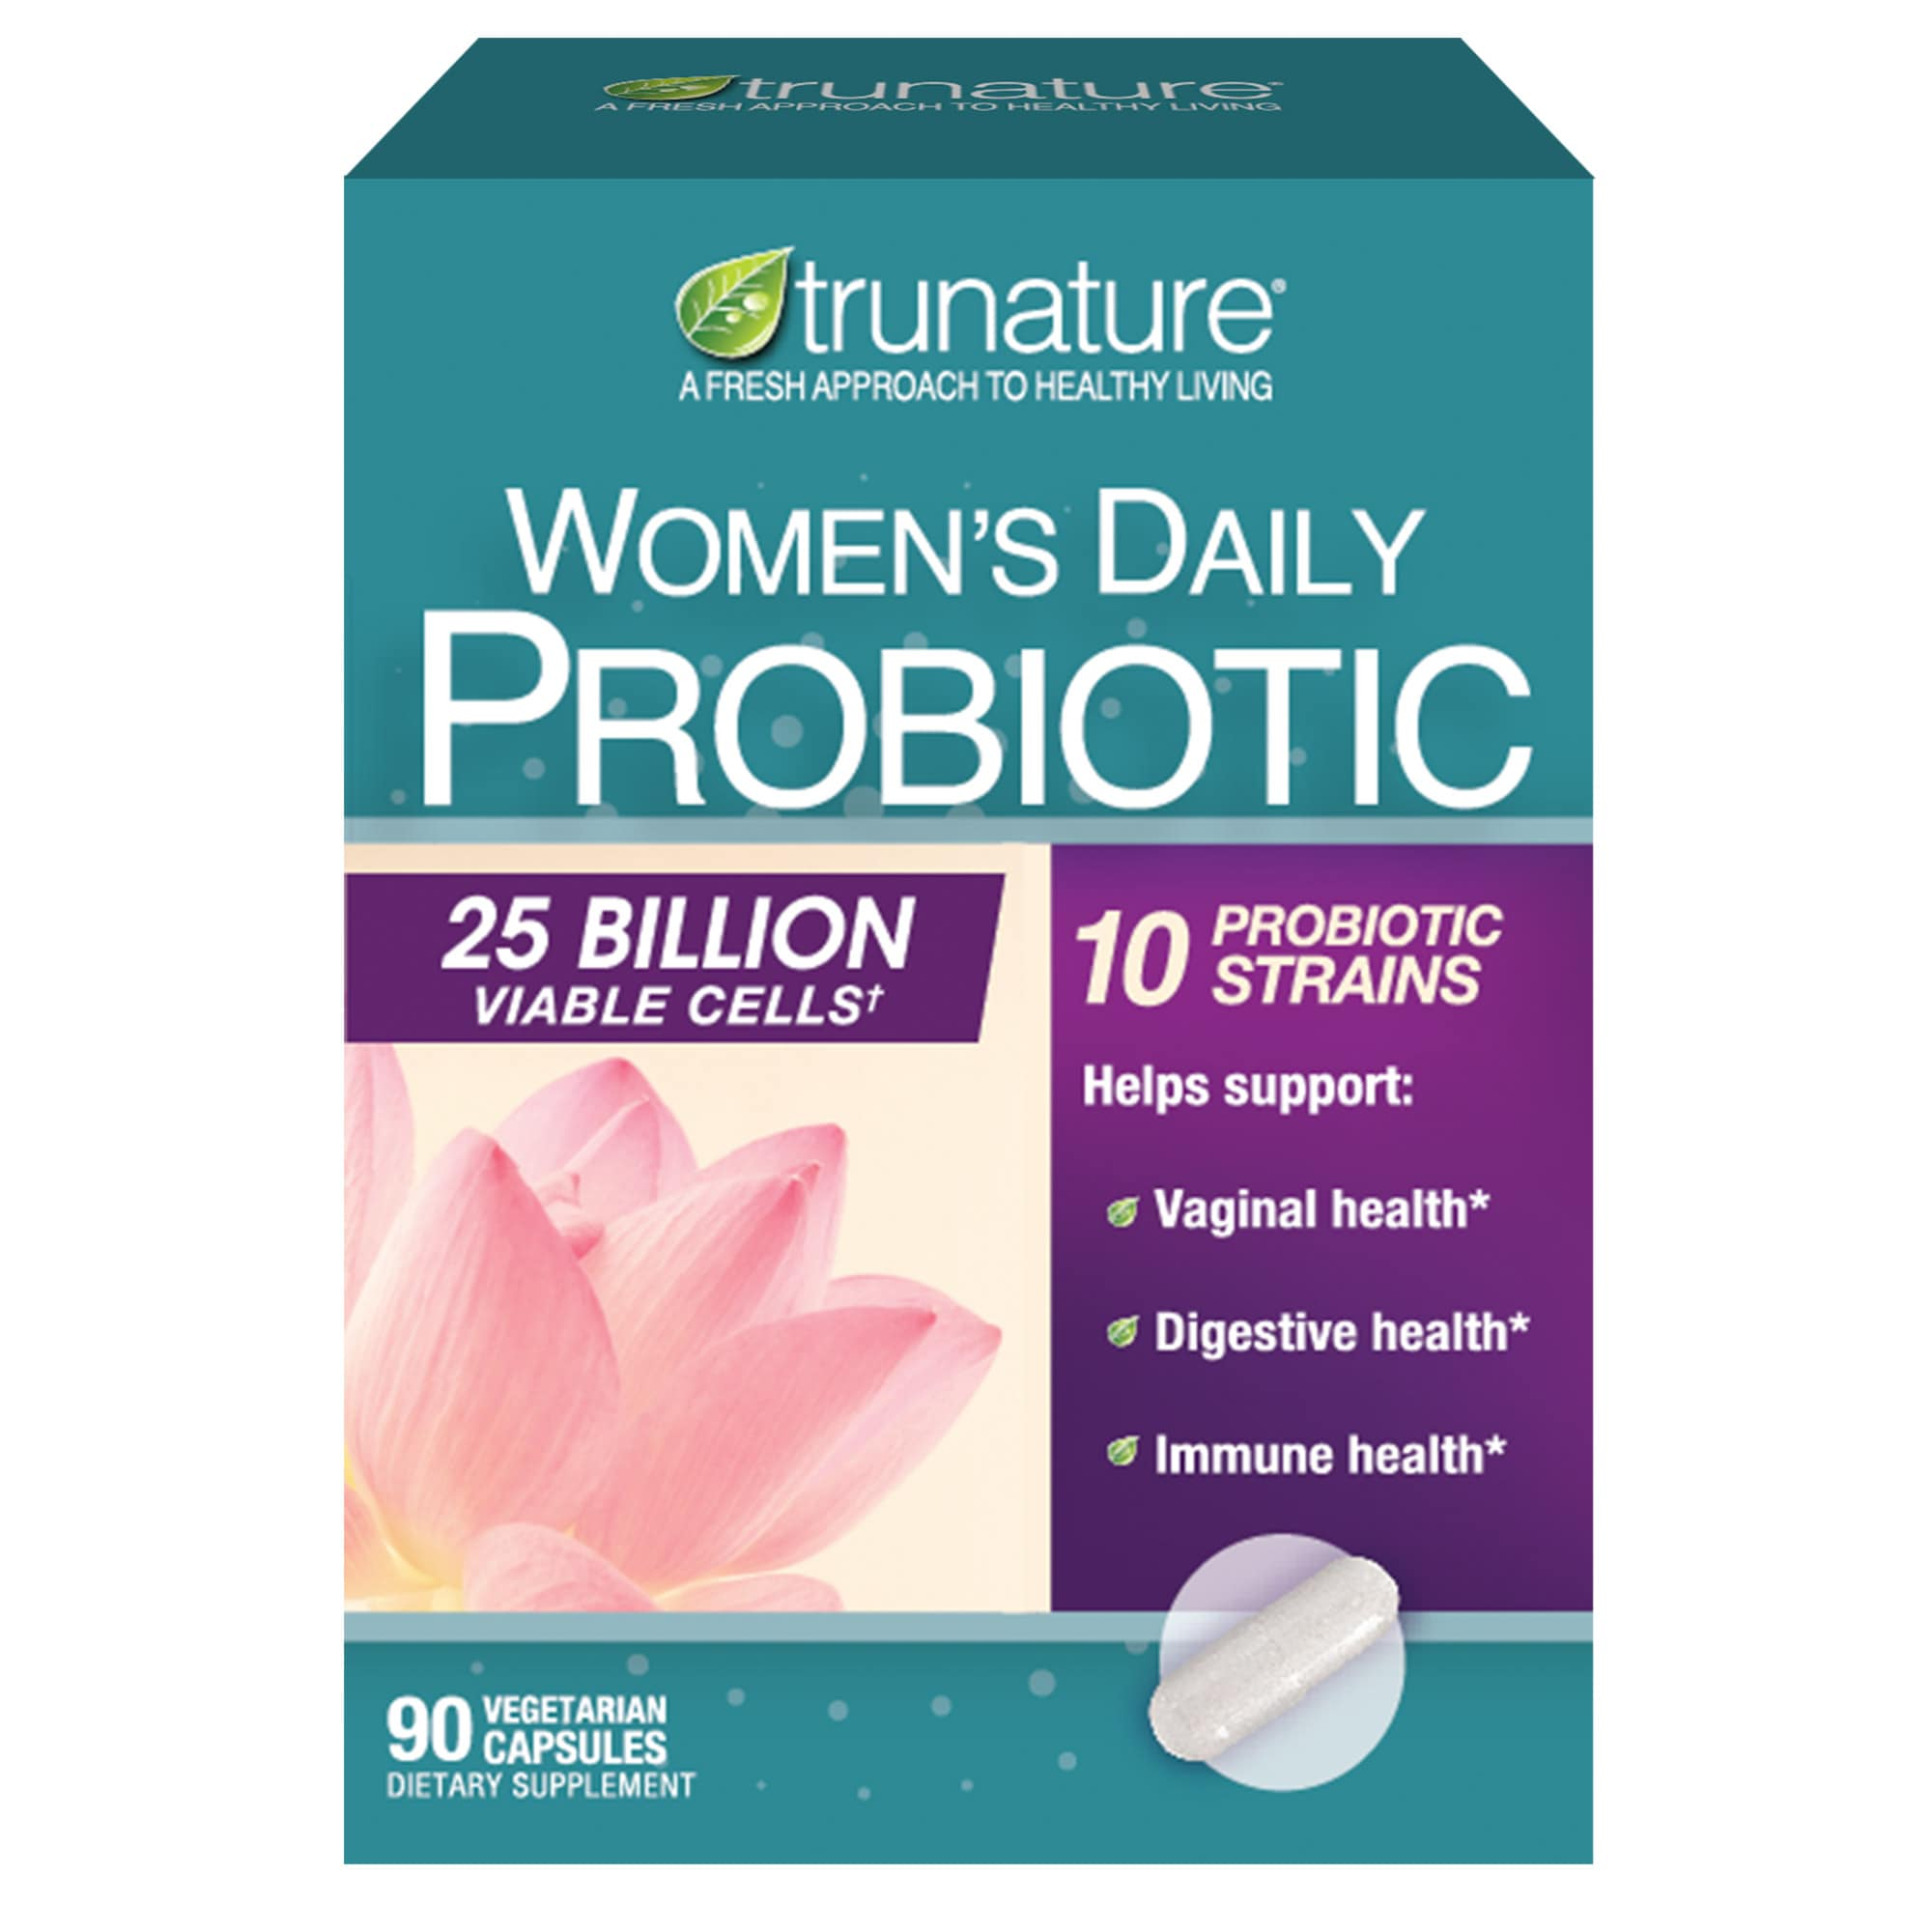 trunature 女性每日益生菌胶囊 Women's Daily Probiotic